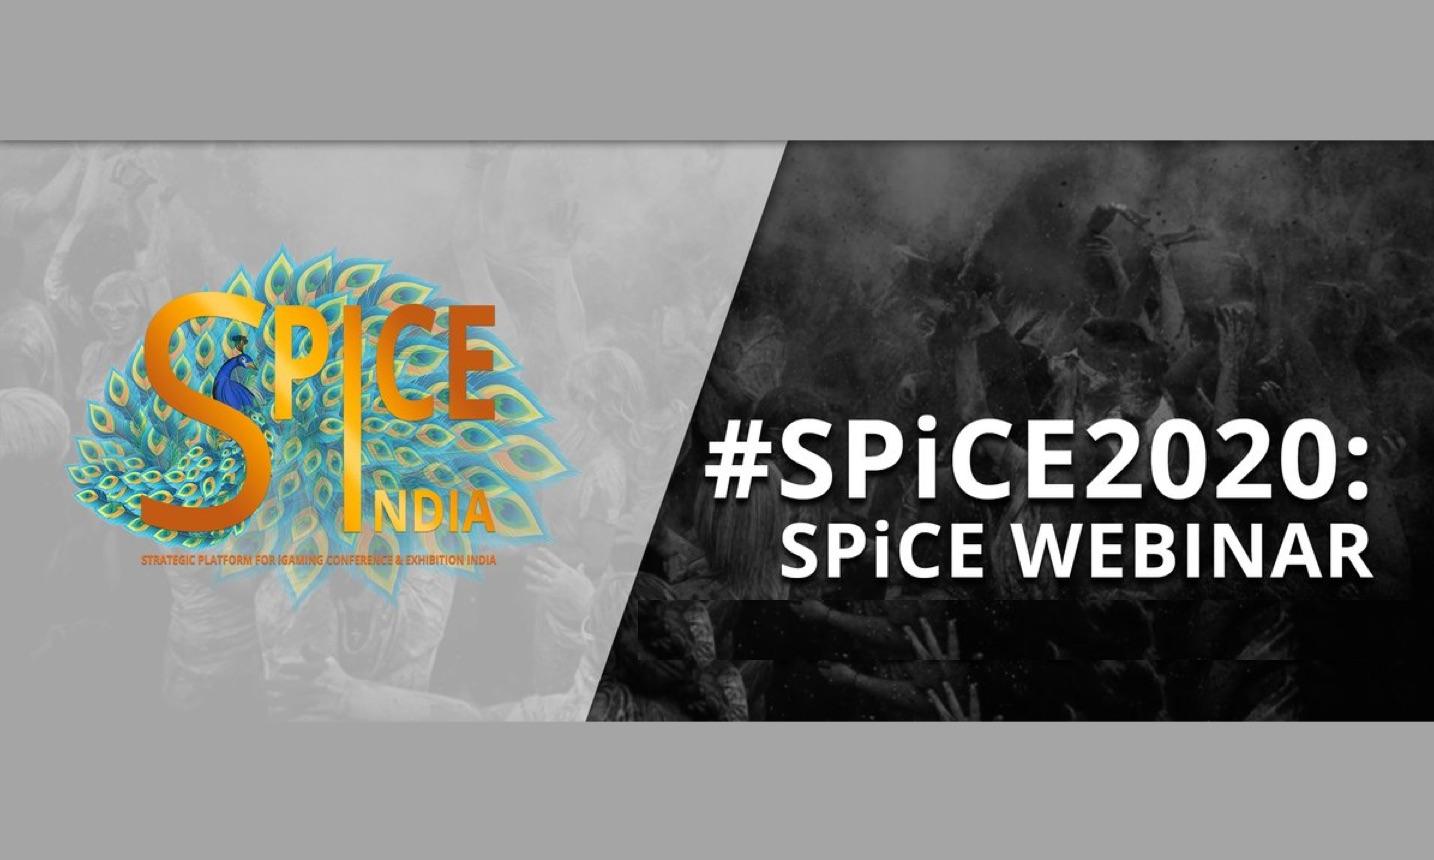 SPICE 2020 Webinar